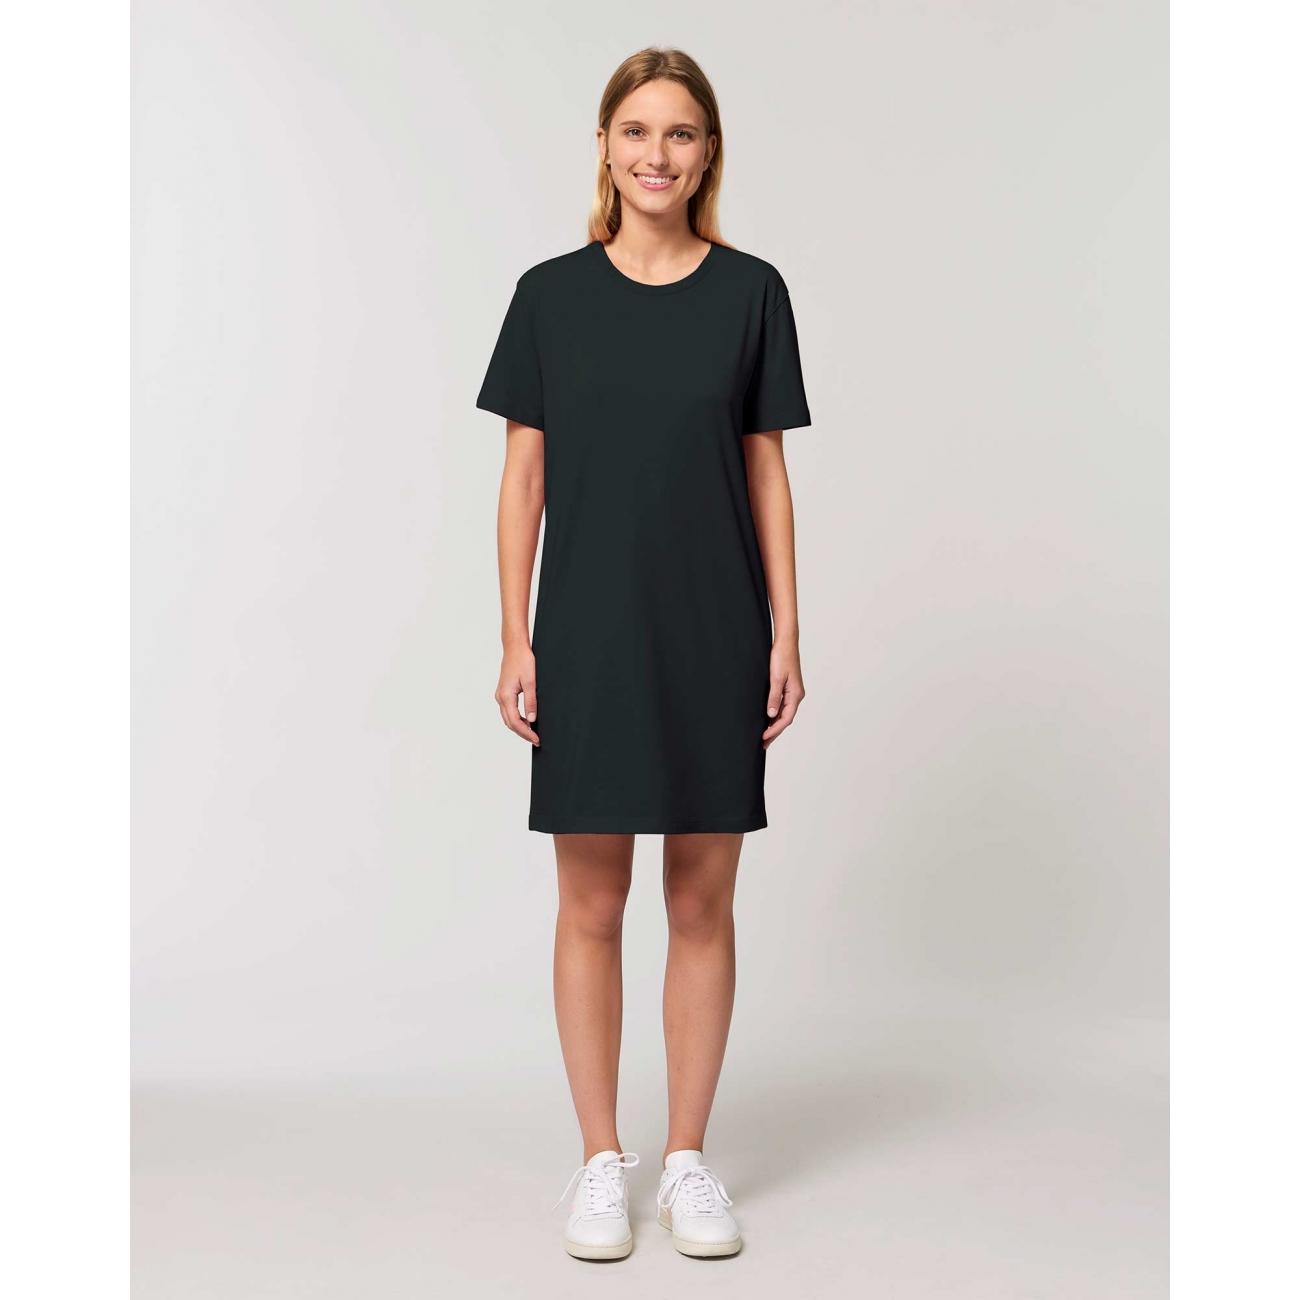 https://tee-shirt-bio.com/9493-thickbox_default/robe-tee-shirt-coton-bio-noir-manches-courtes.jpg